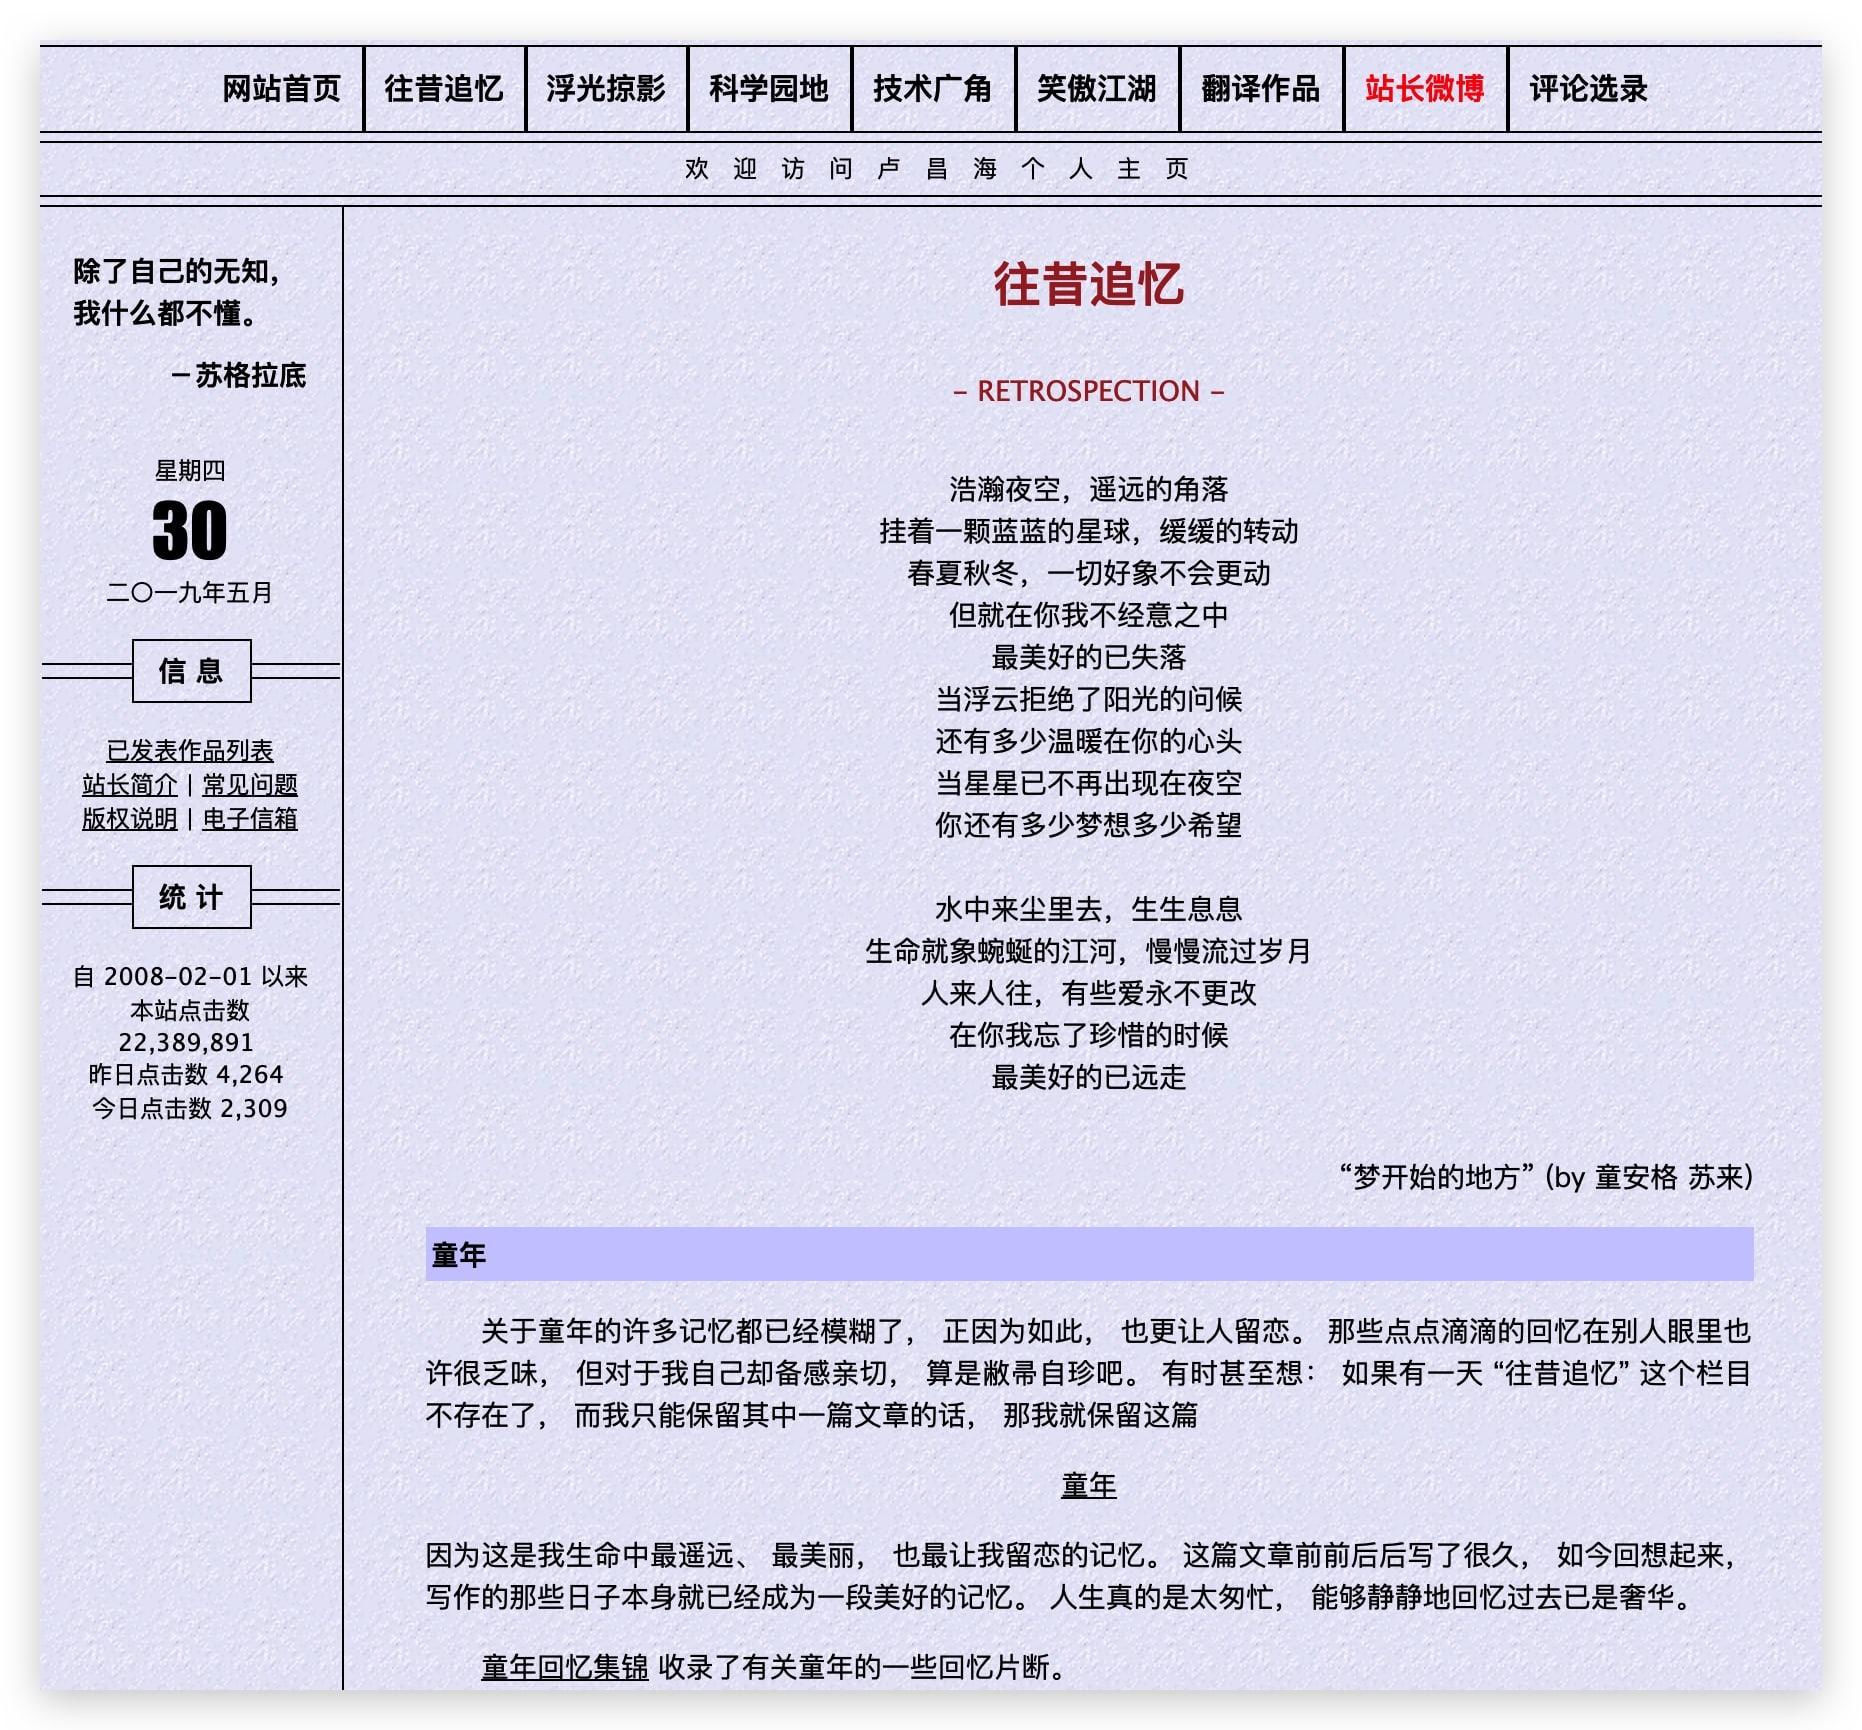 Xnip2019-05-30_01-24-00.jpg-496.4kB